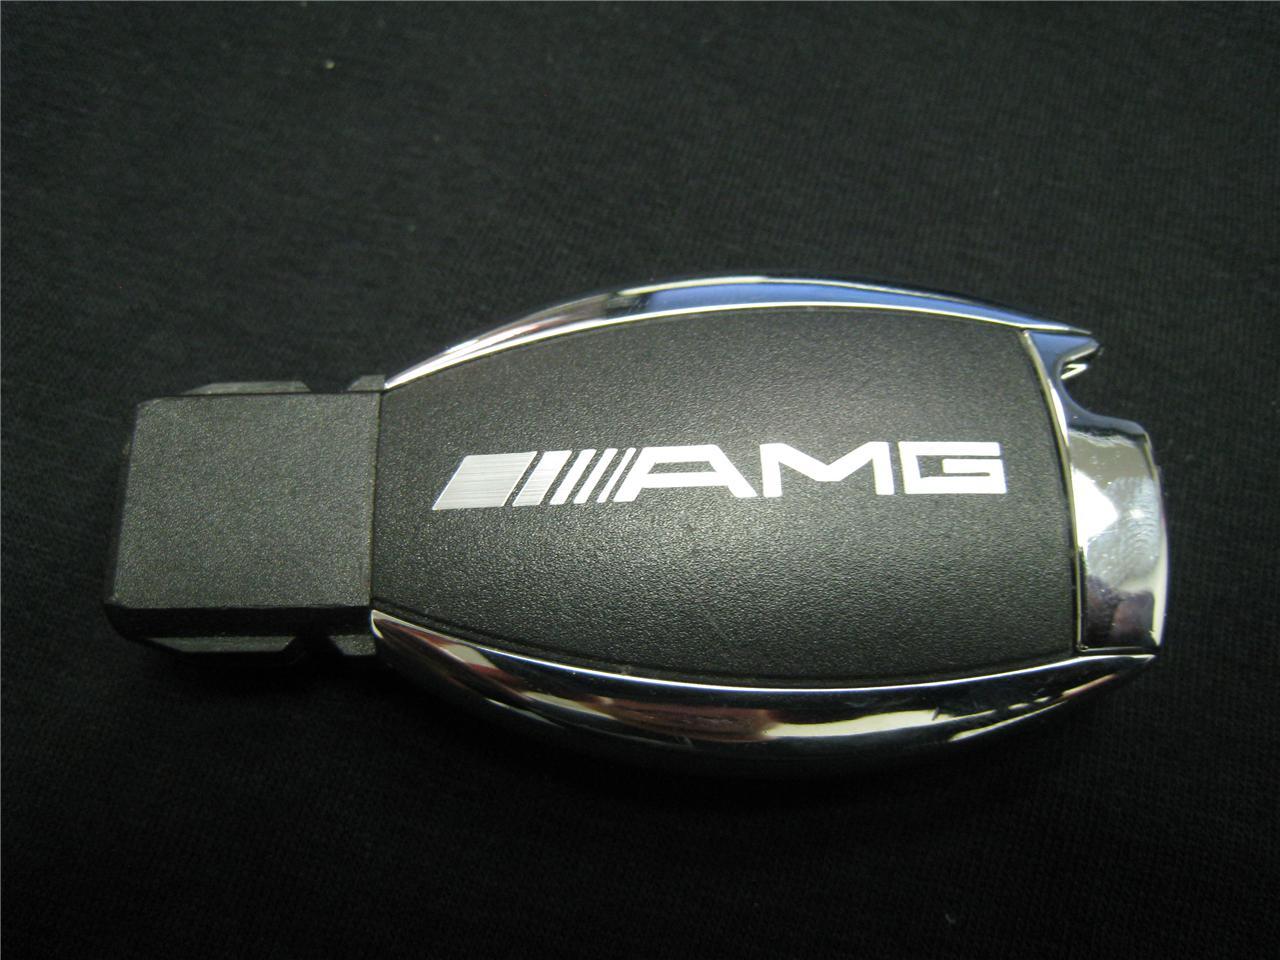 2pcs amg decal sticker mercedes benz car key ebay for Mercedes benz car key